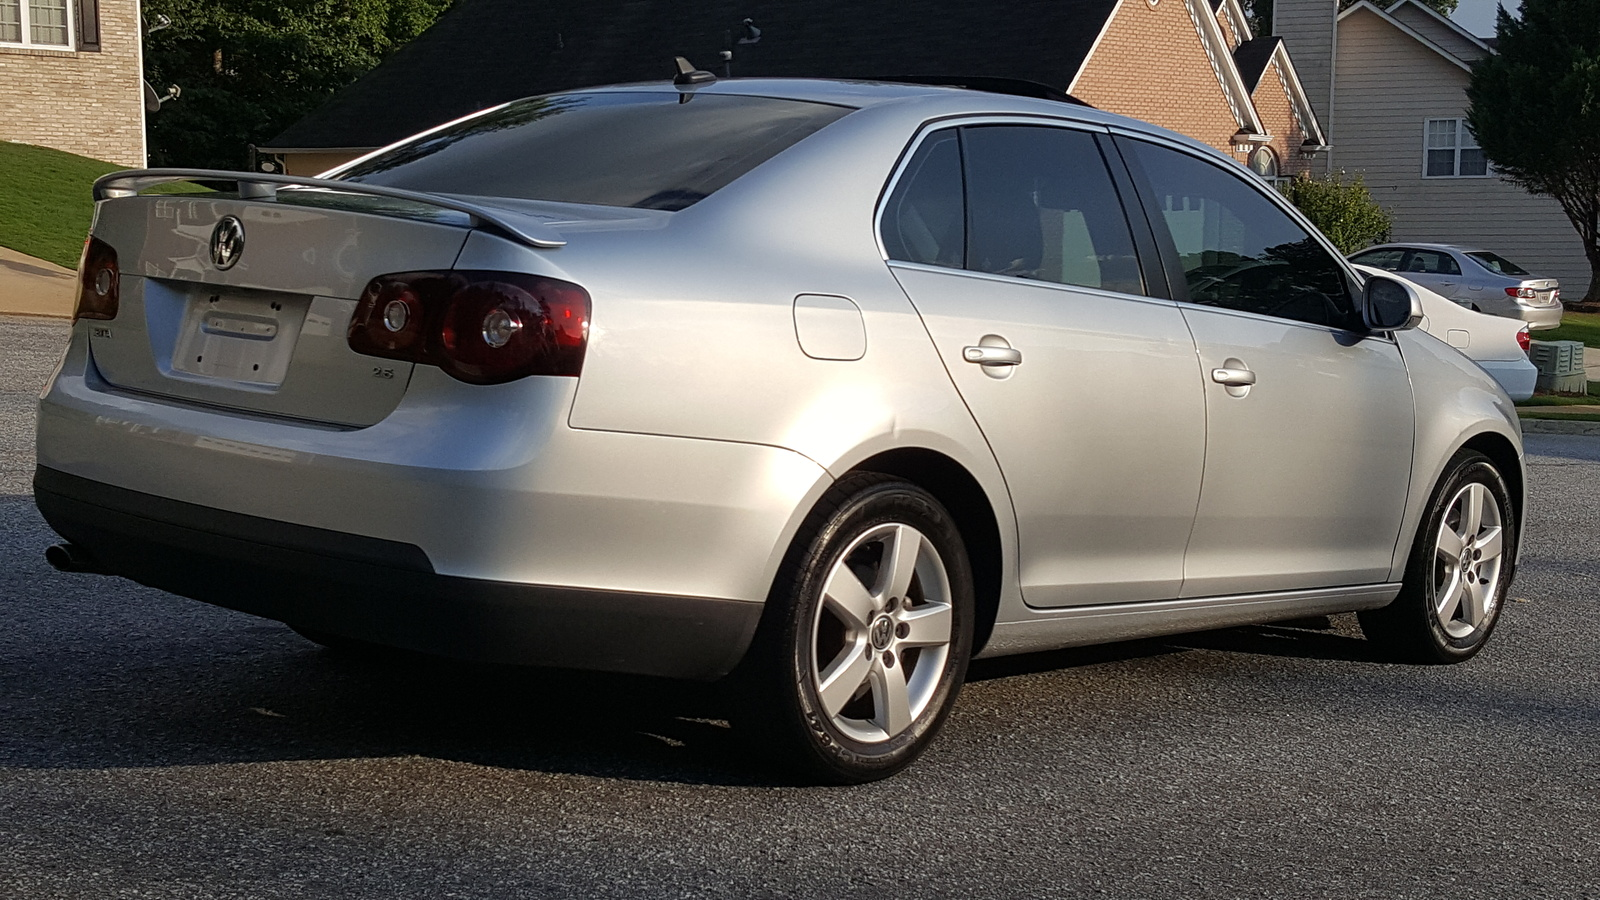 International Harvester Logo >> 2009 Volkswagen Jetta - Overview - CarGurus